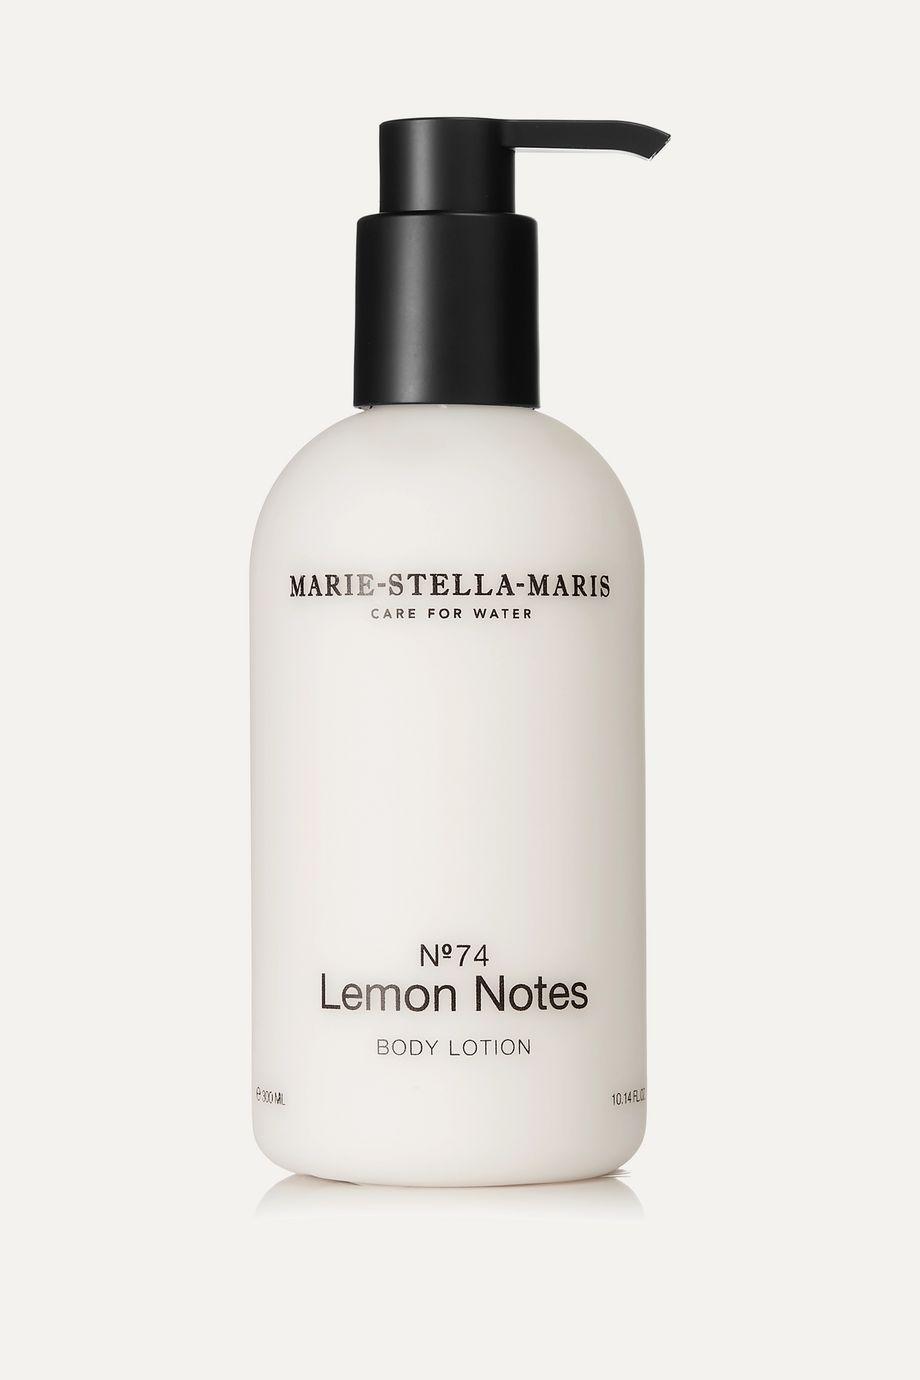 Marie-Stella-Maris No.74 Body Lotion – Lemon Notes, 300 ml – Bodylotion